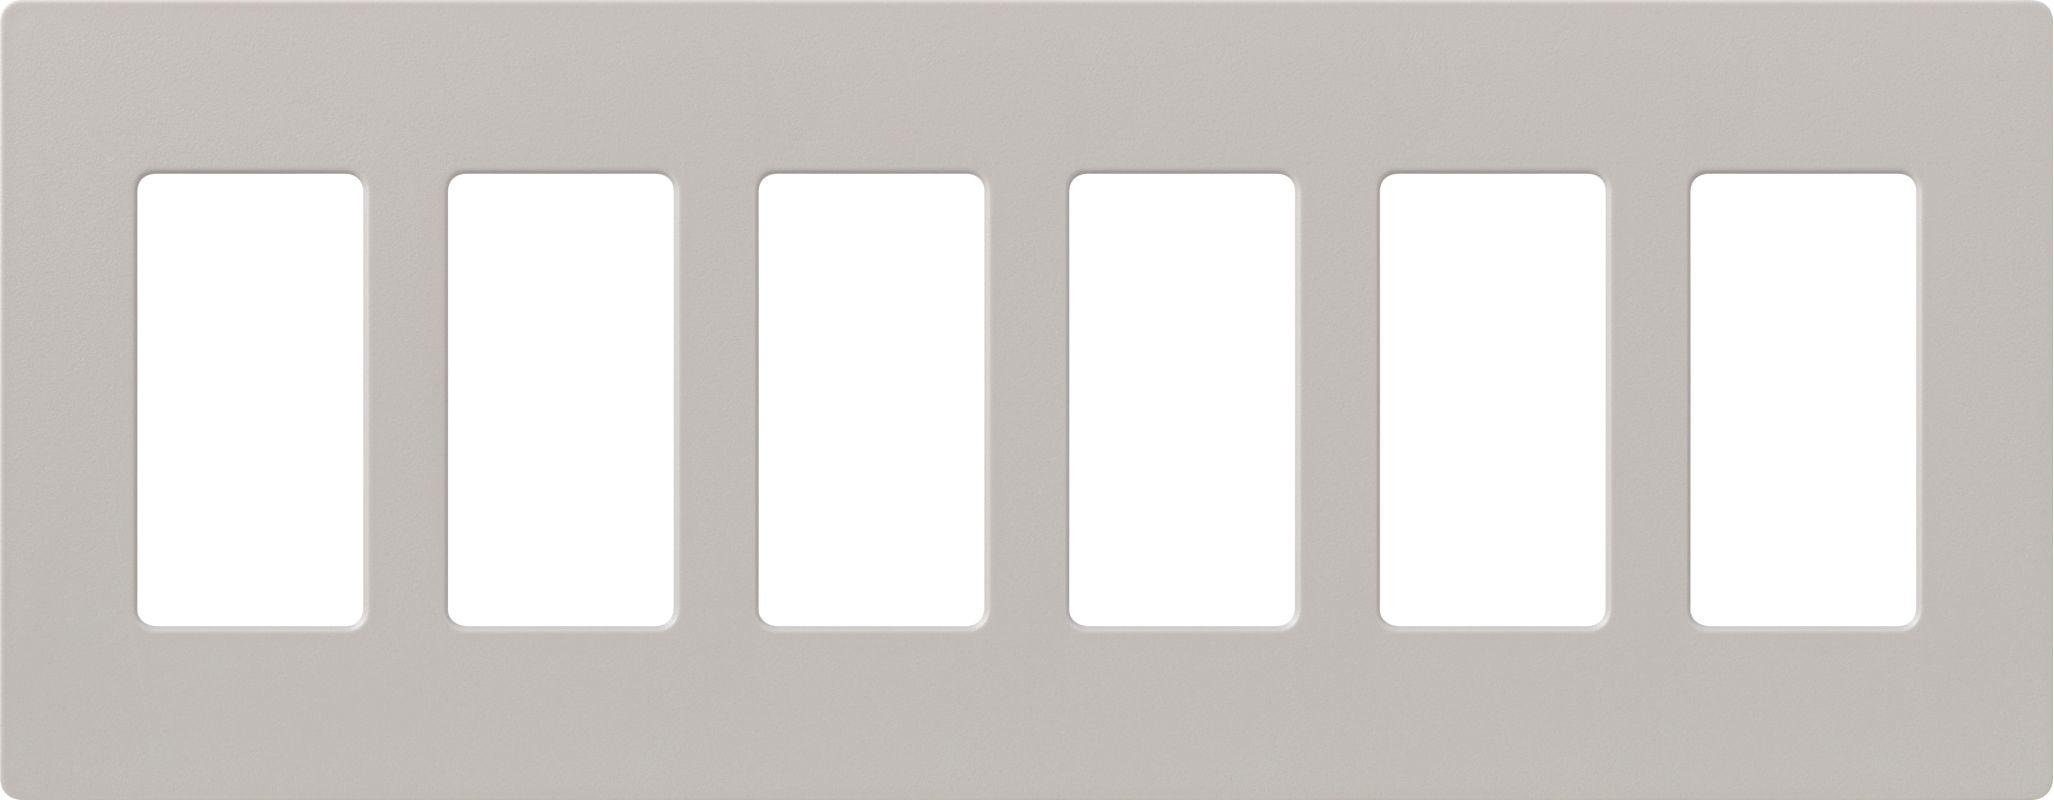 Lutron CW-6 Claro Six Gang Designer Wall Plate Taupe Wall Controls